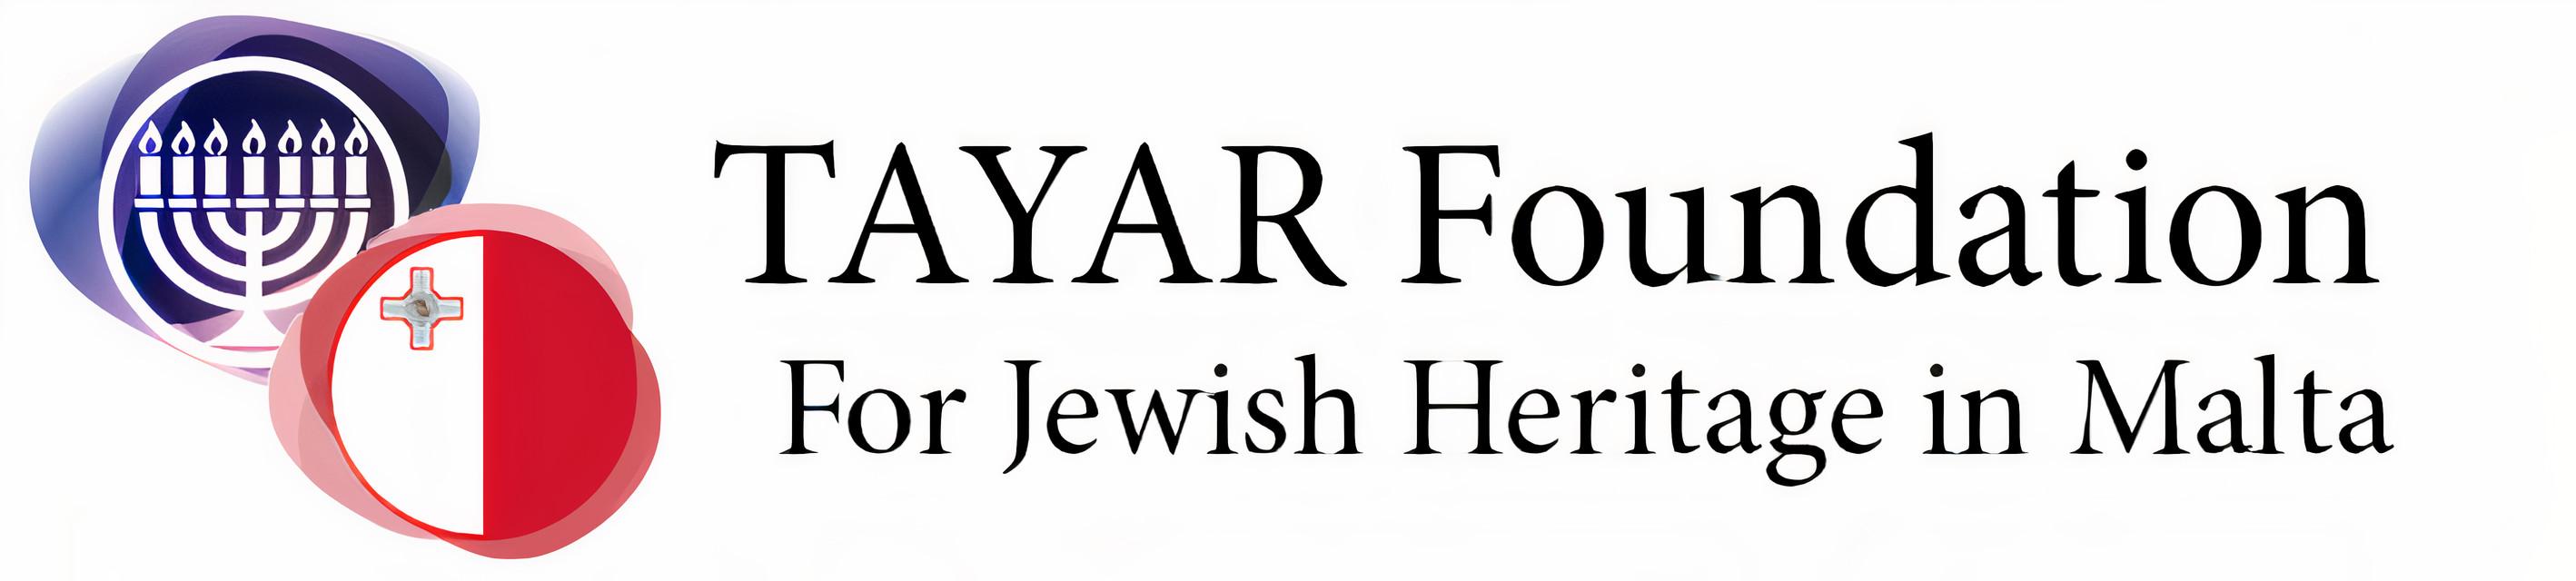 TAYAR Foundation